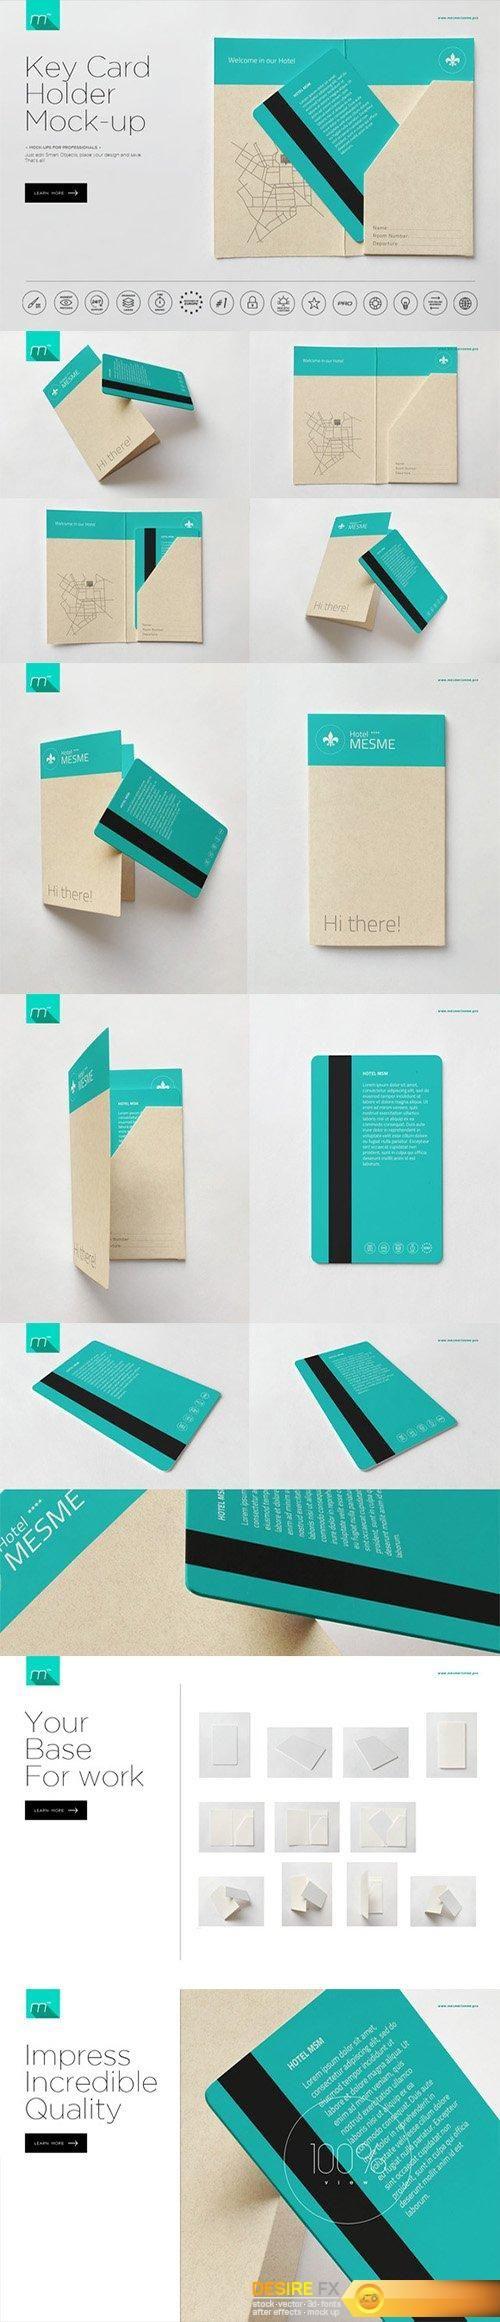 504471-Hotel-Key-Card-Holder-Mock-up http://www.desirefx.me/hotel-key-card-holder-mock-up-creativemarket-504471/